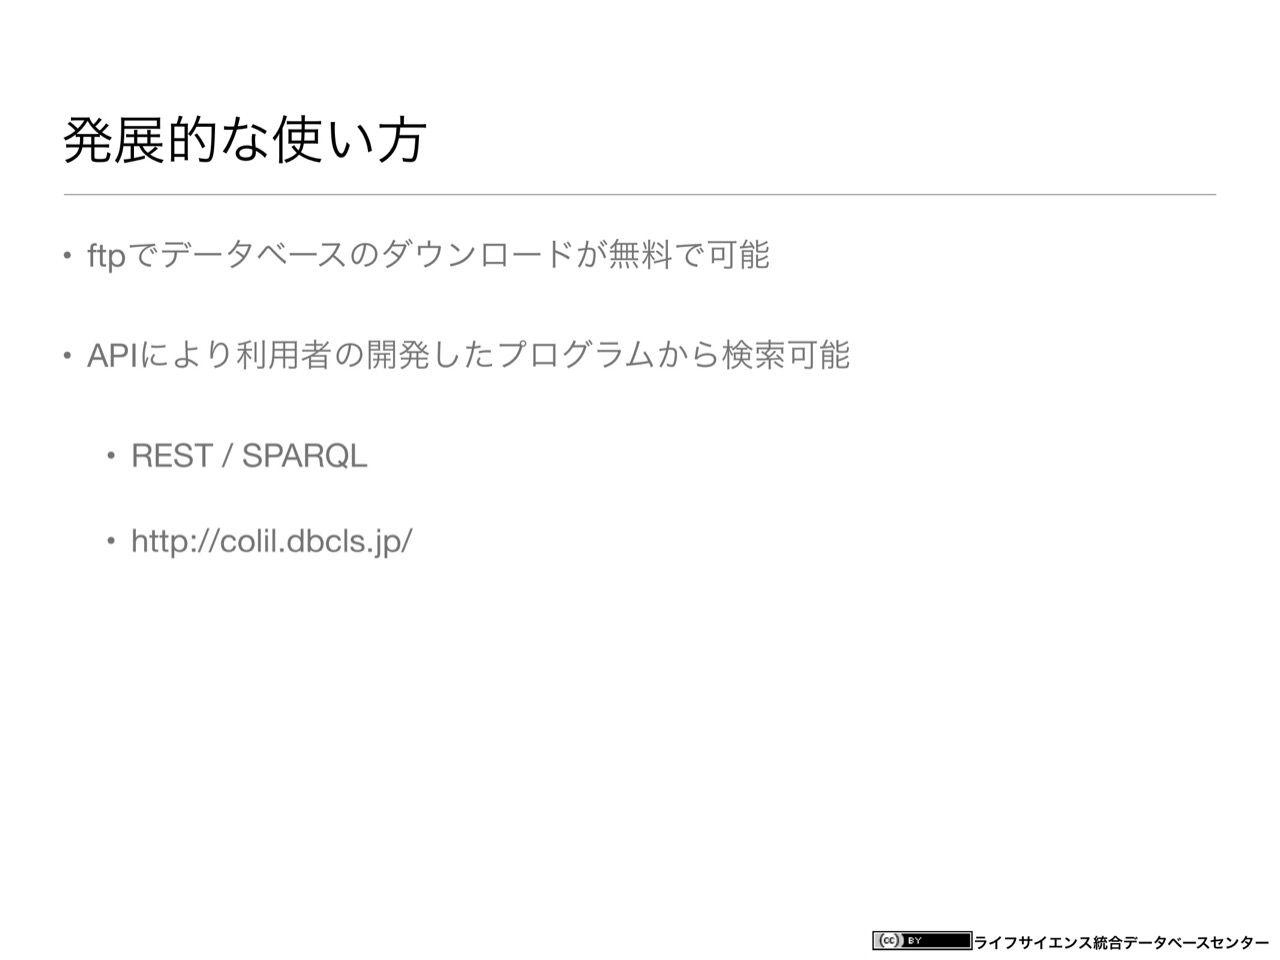 images/AJACS60_yamamoto_063.jpg